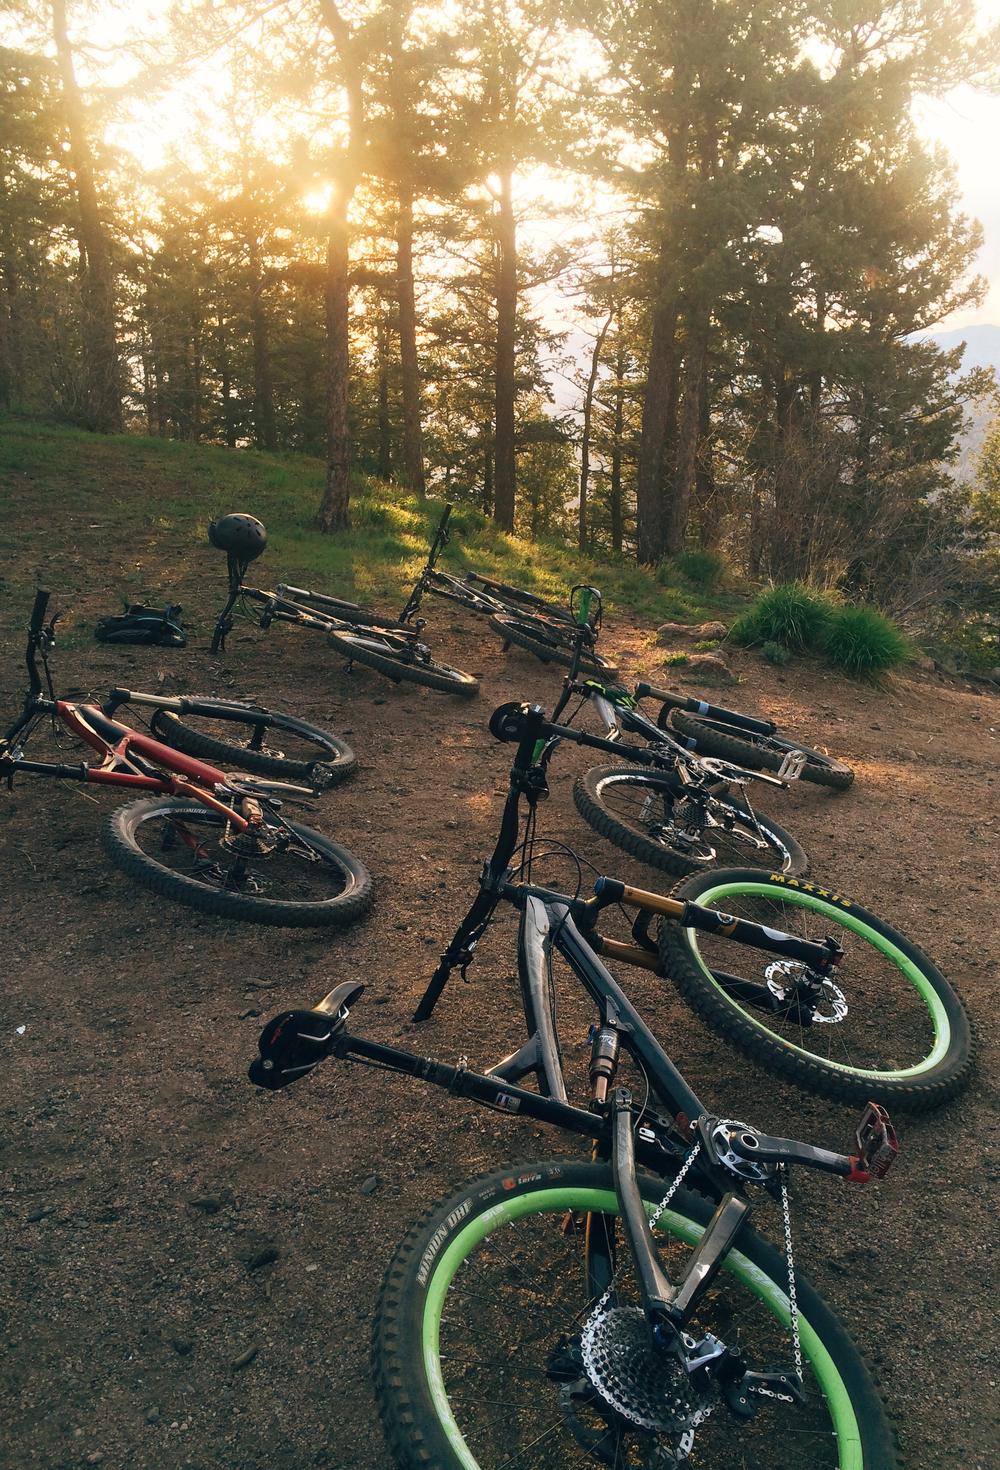 bikes2_CROP.jpg